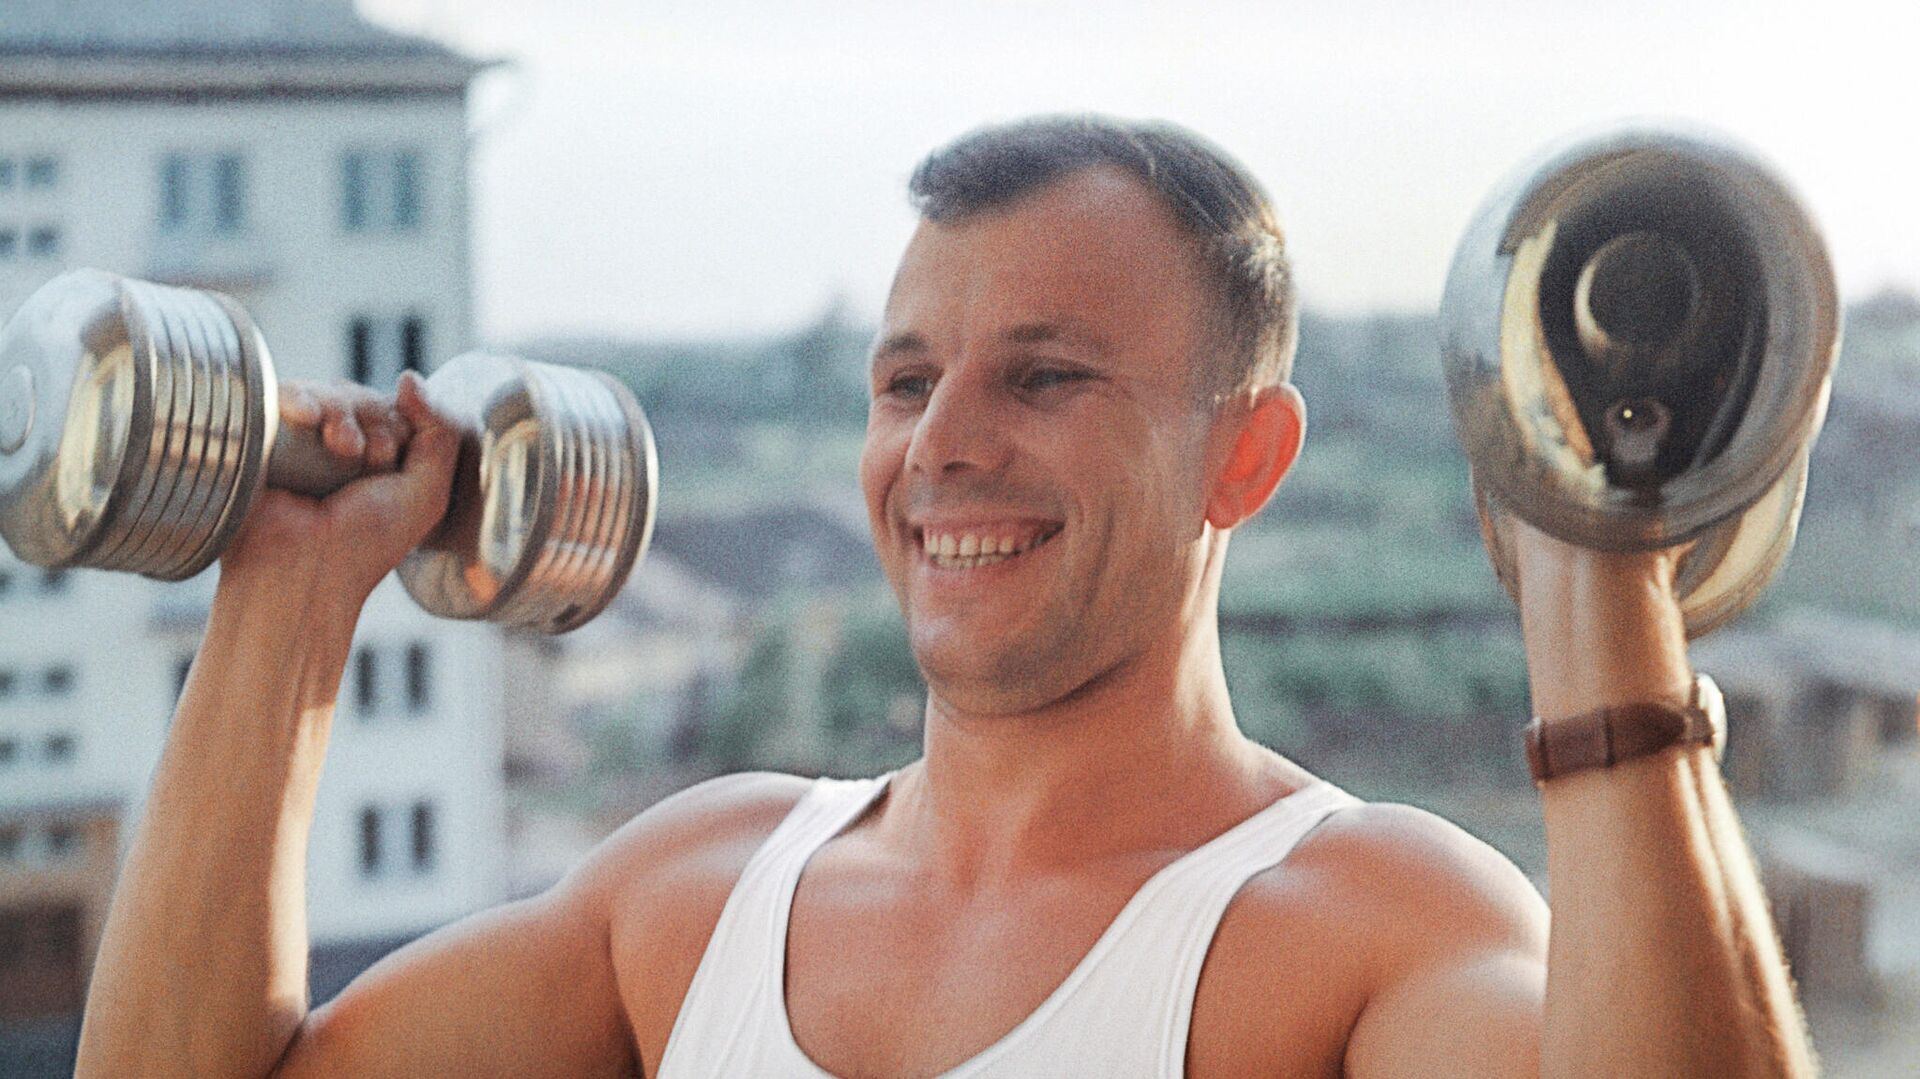 Yuri Gagarin, cosmonauta soviético, realiza ejercicios matutinos - Sputnik Mundo, 1920, 10.04.2021